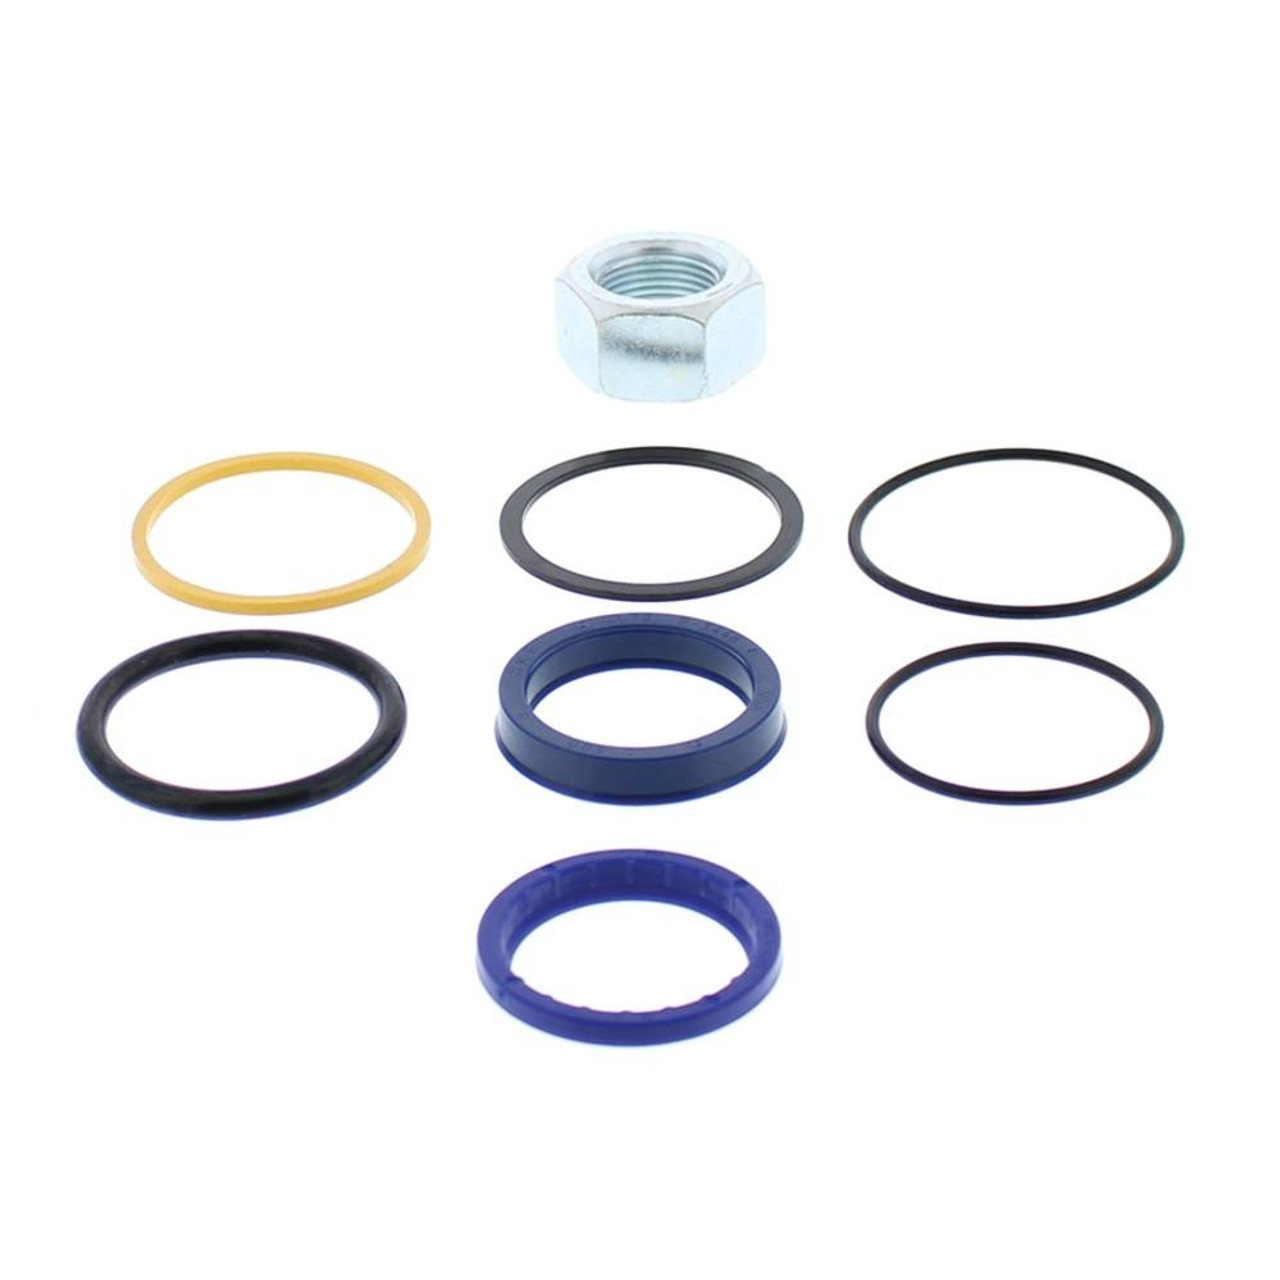 Hydraulic Cylinder Seal Kit For Bobcat 753 Skid Steer 763 Skid Steer 7135558